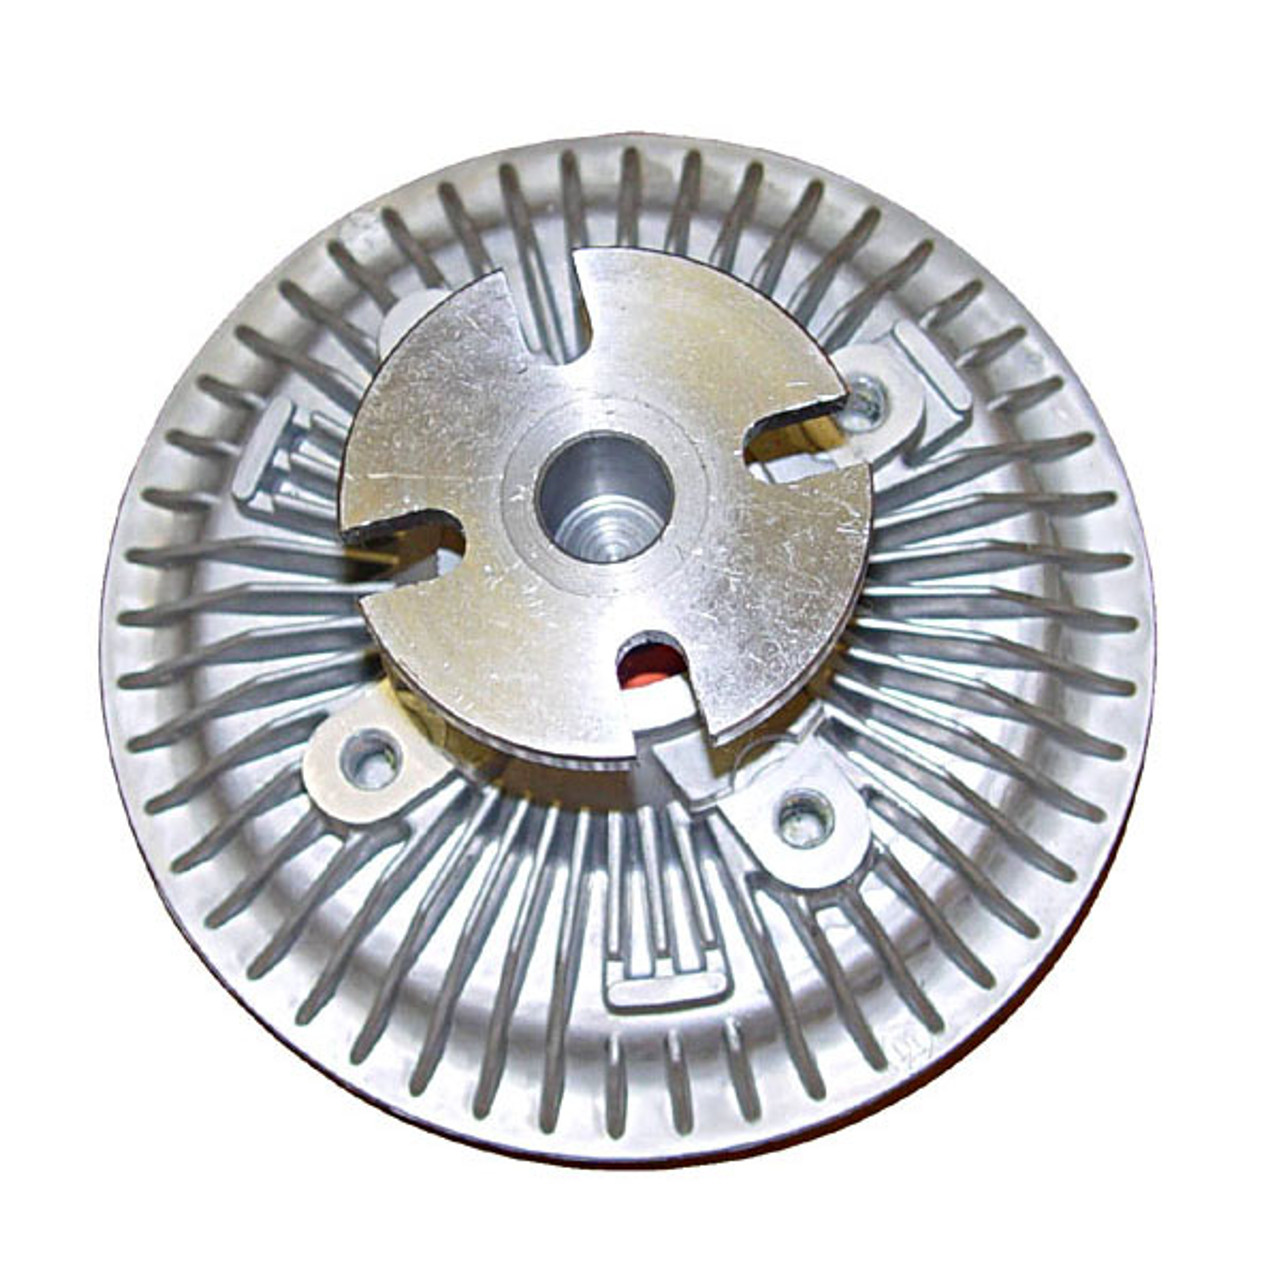 with 4.0L Omix-ADA 17105.04 Fan Clutch for 91-95 Jeep Wrangler YJ